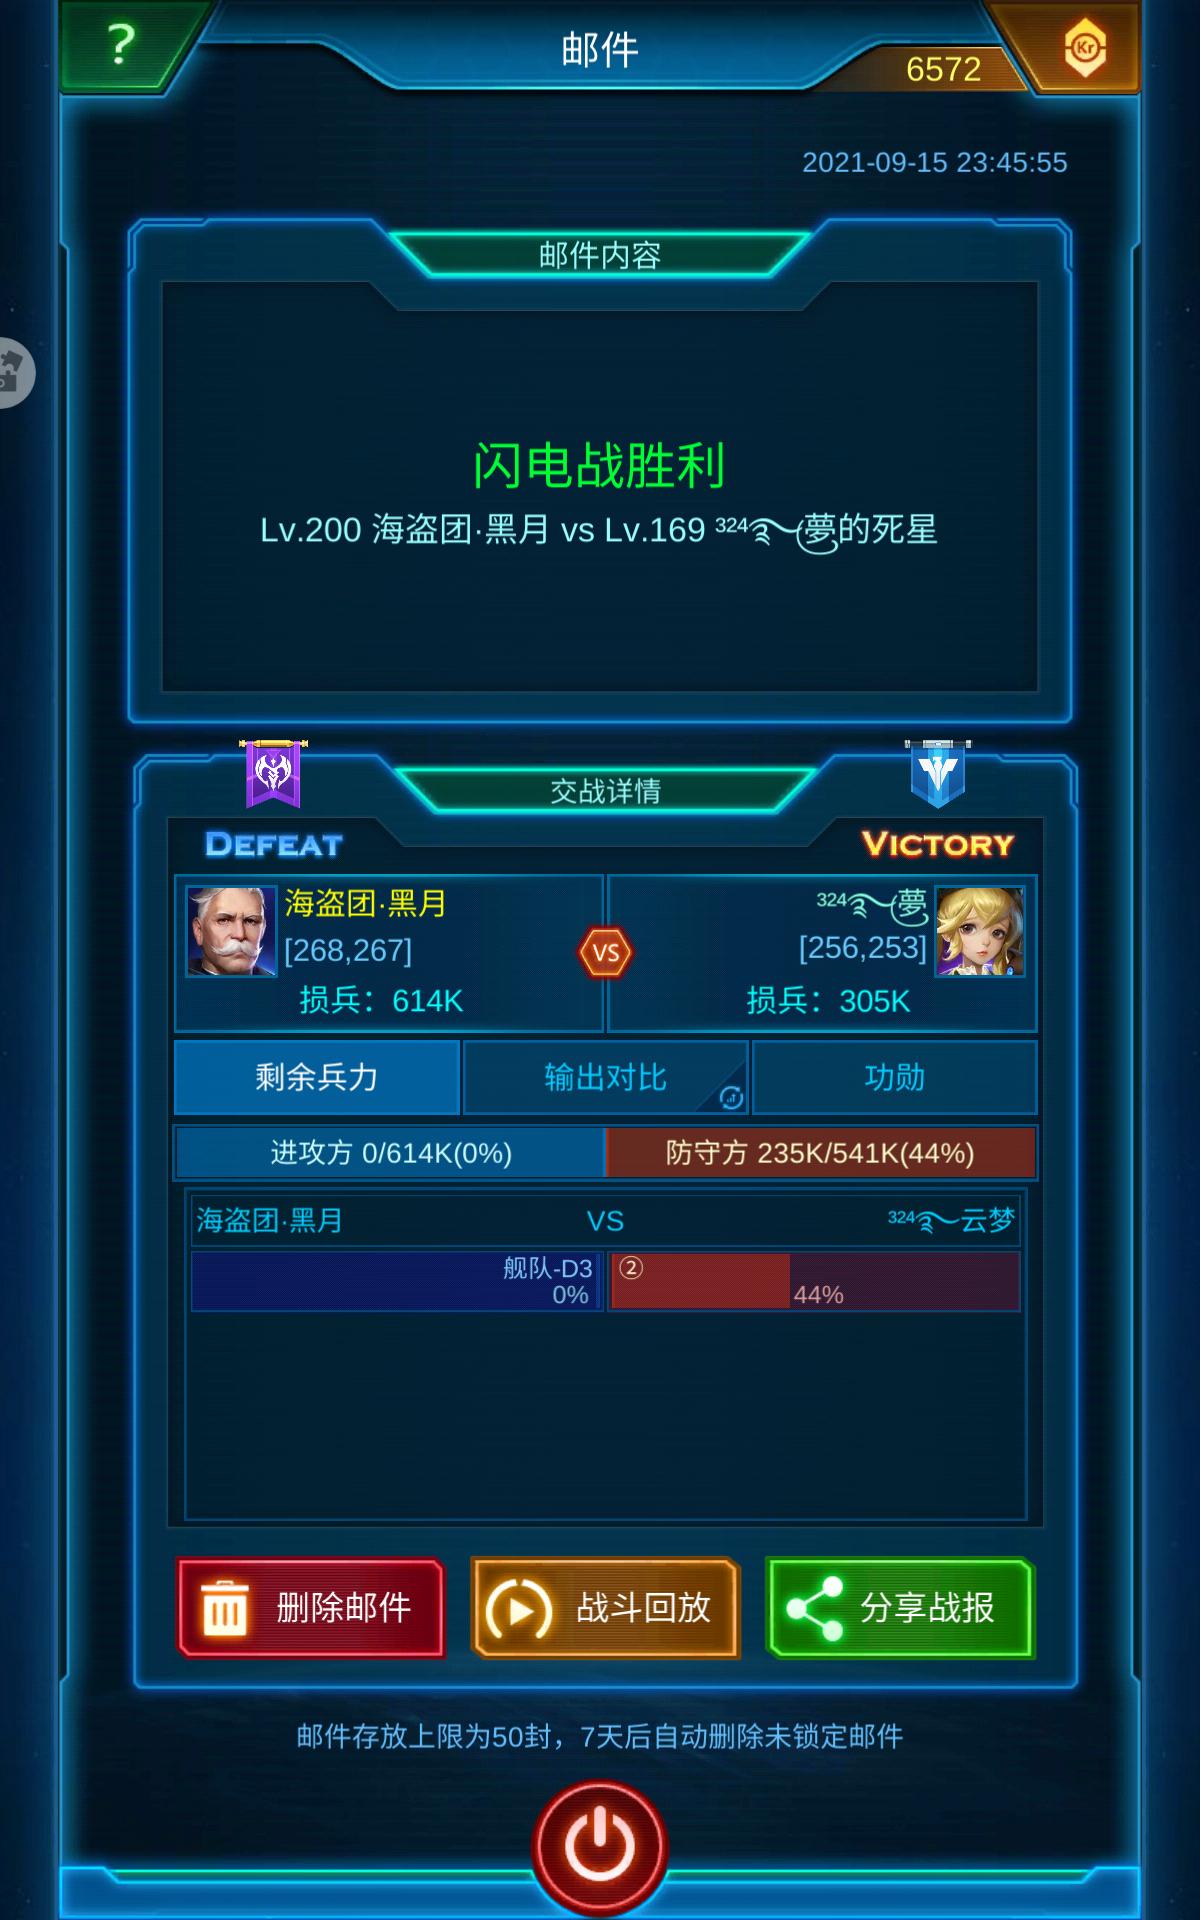 Screenshot_2021-09-15-23-47-32-414_com.jedigames.p16s.huawei.png